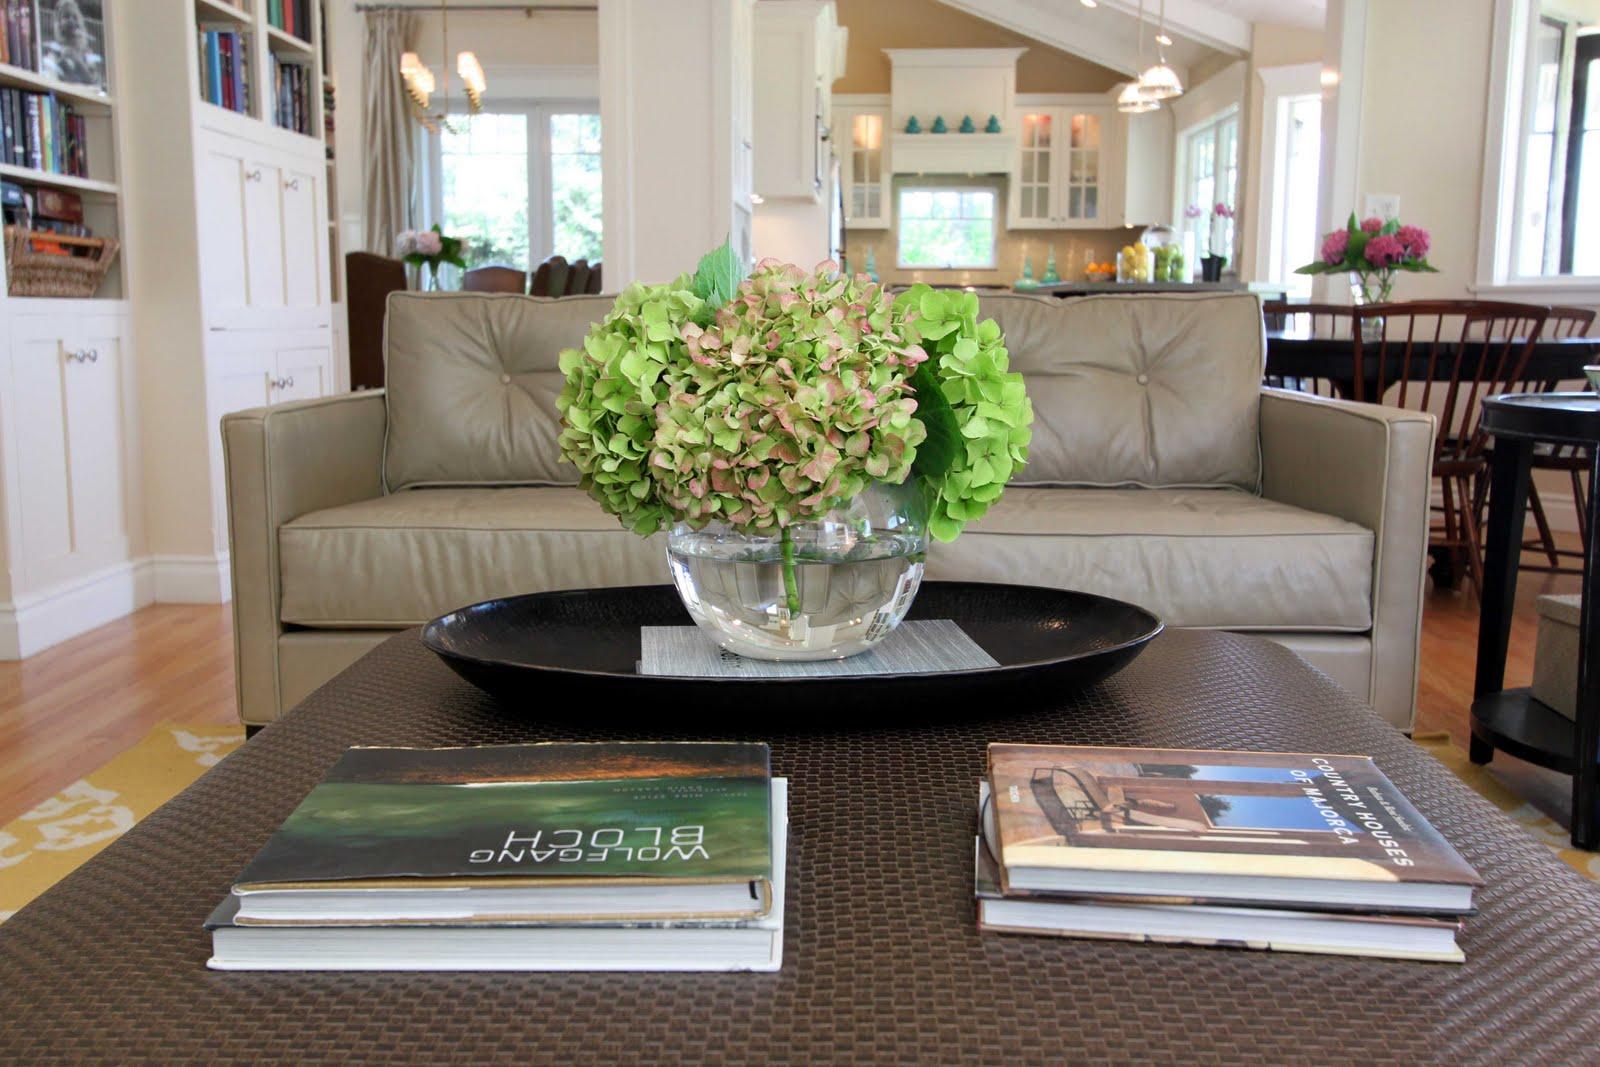 stiles | fischer interior design before and after #2